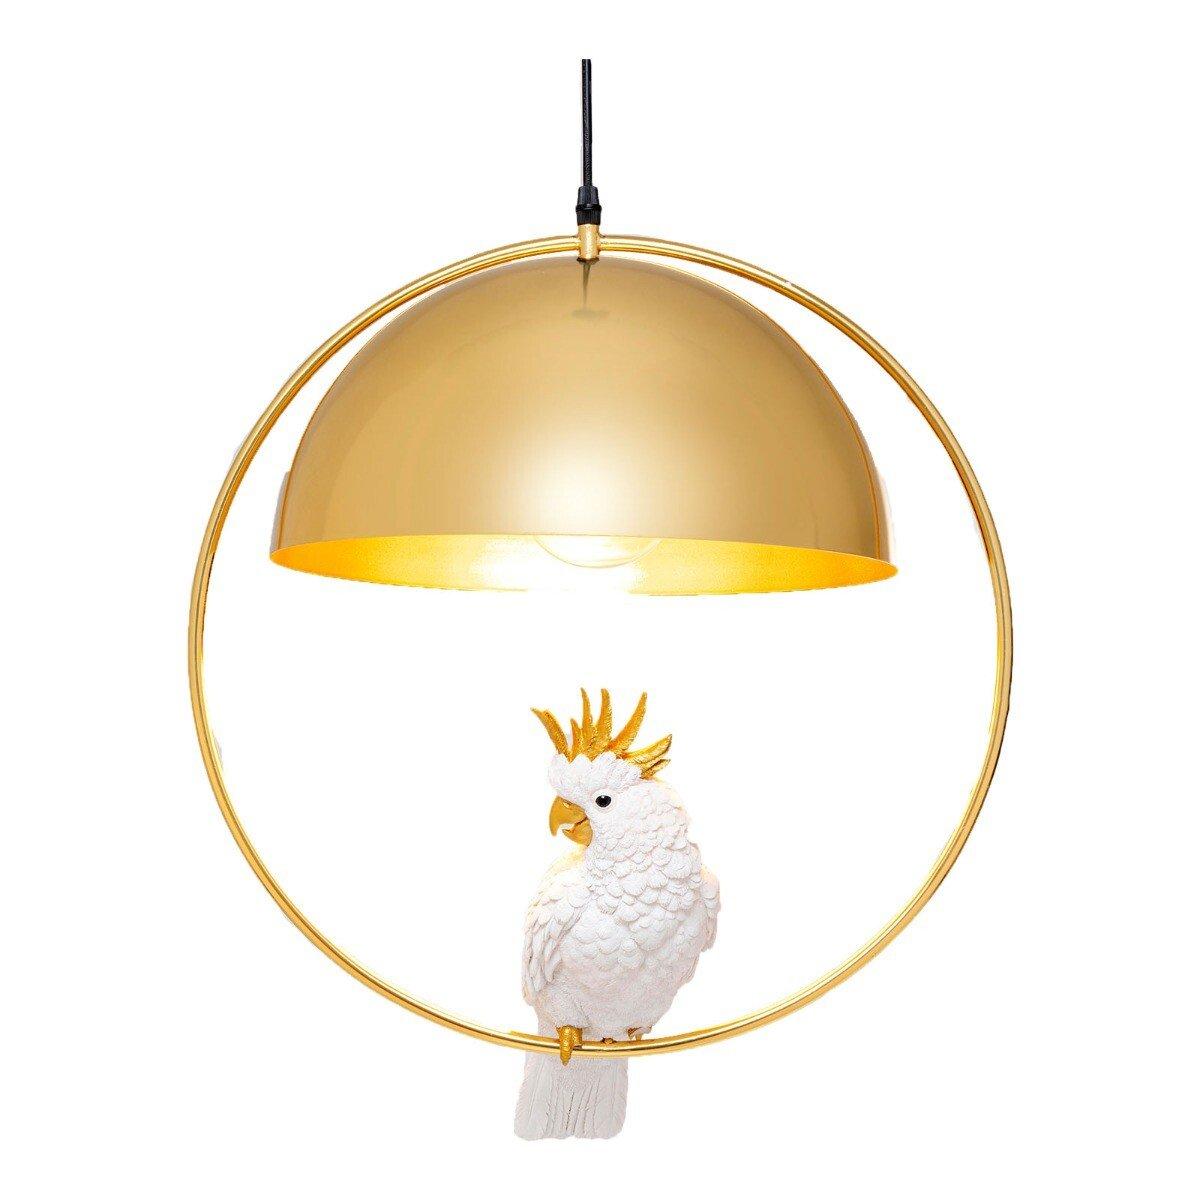 Kare Design hanglamp pendant cockatoo goud 60 x 45,5 x 45,5